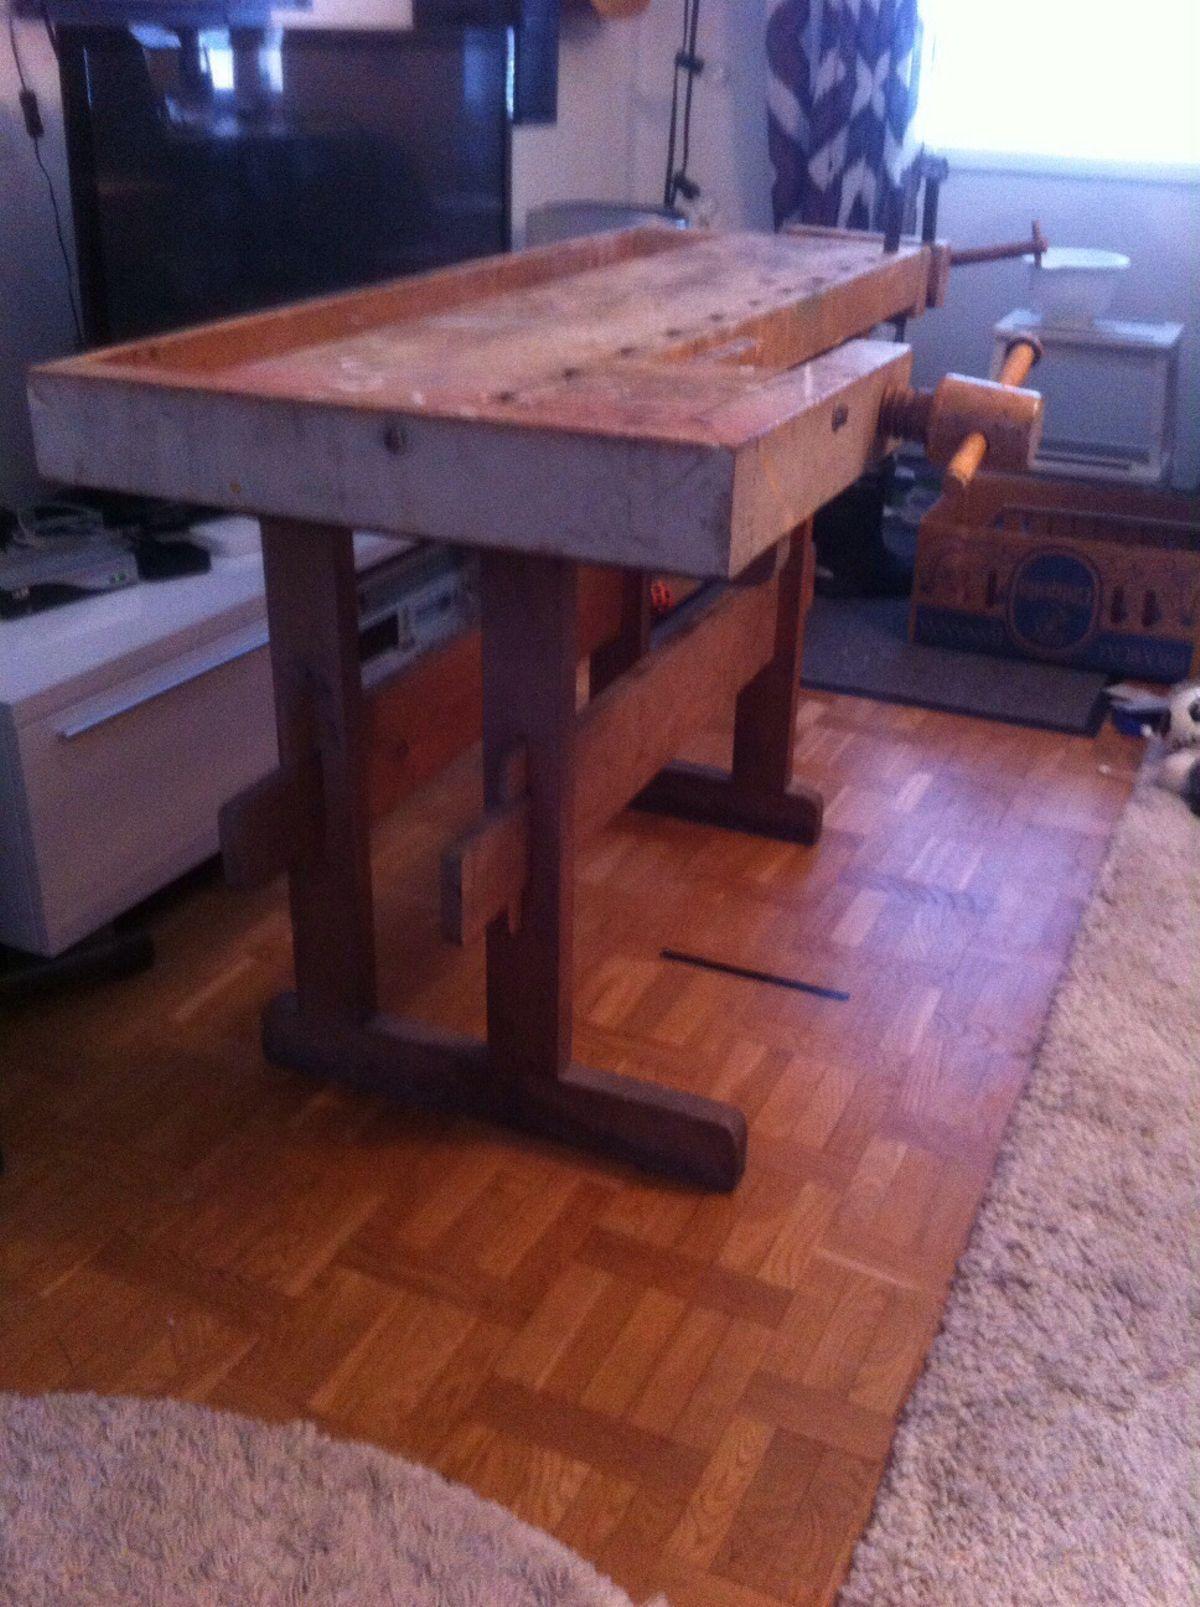 Pin på TRÄ pyssel snickeri möbler